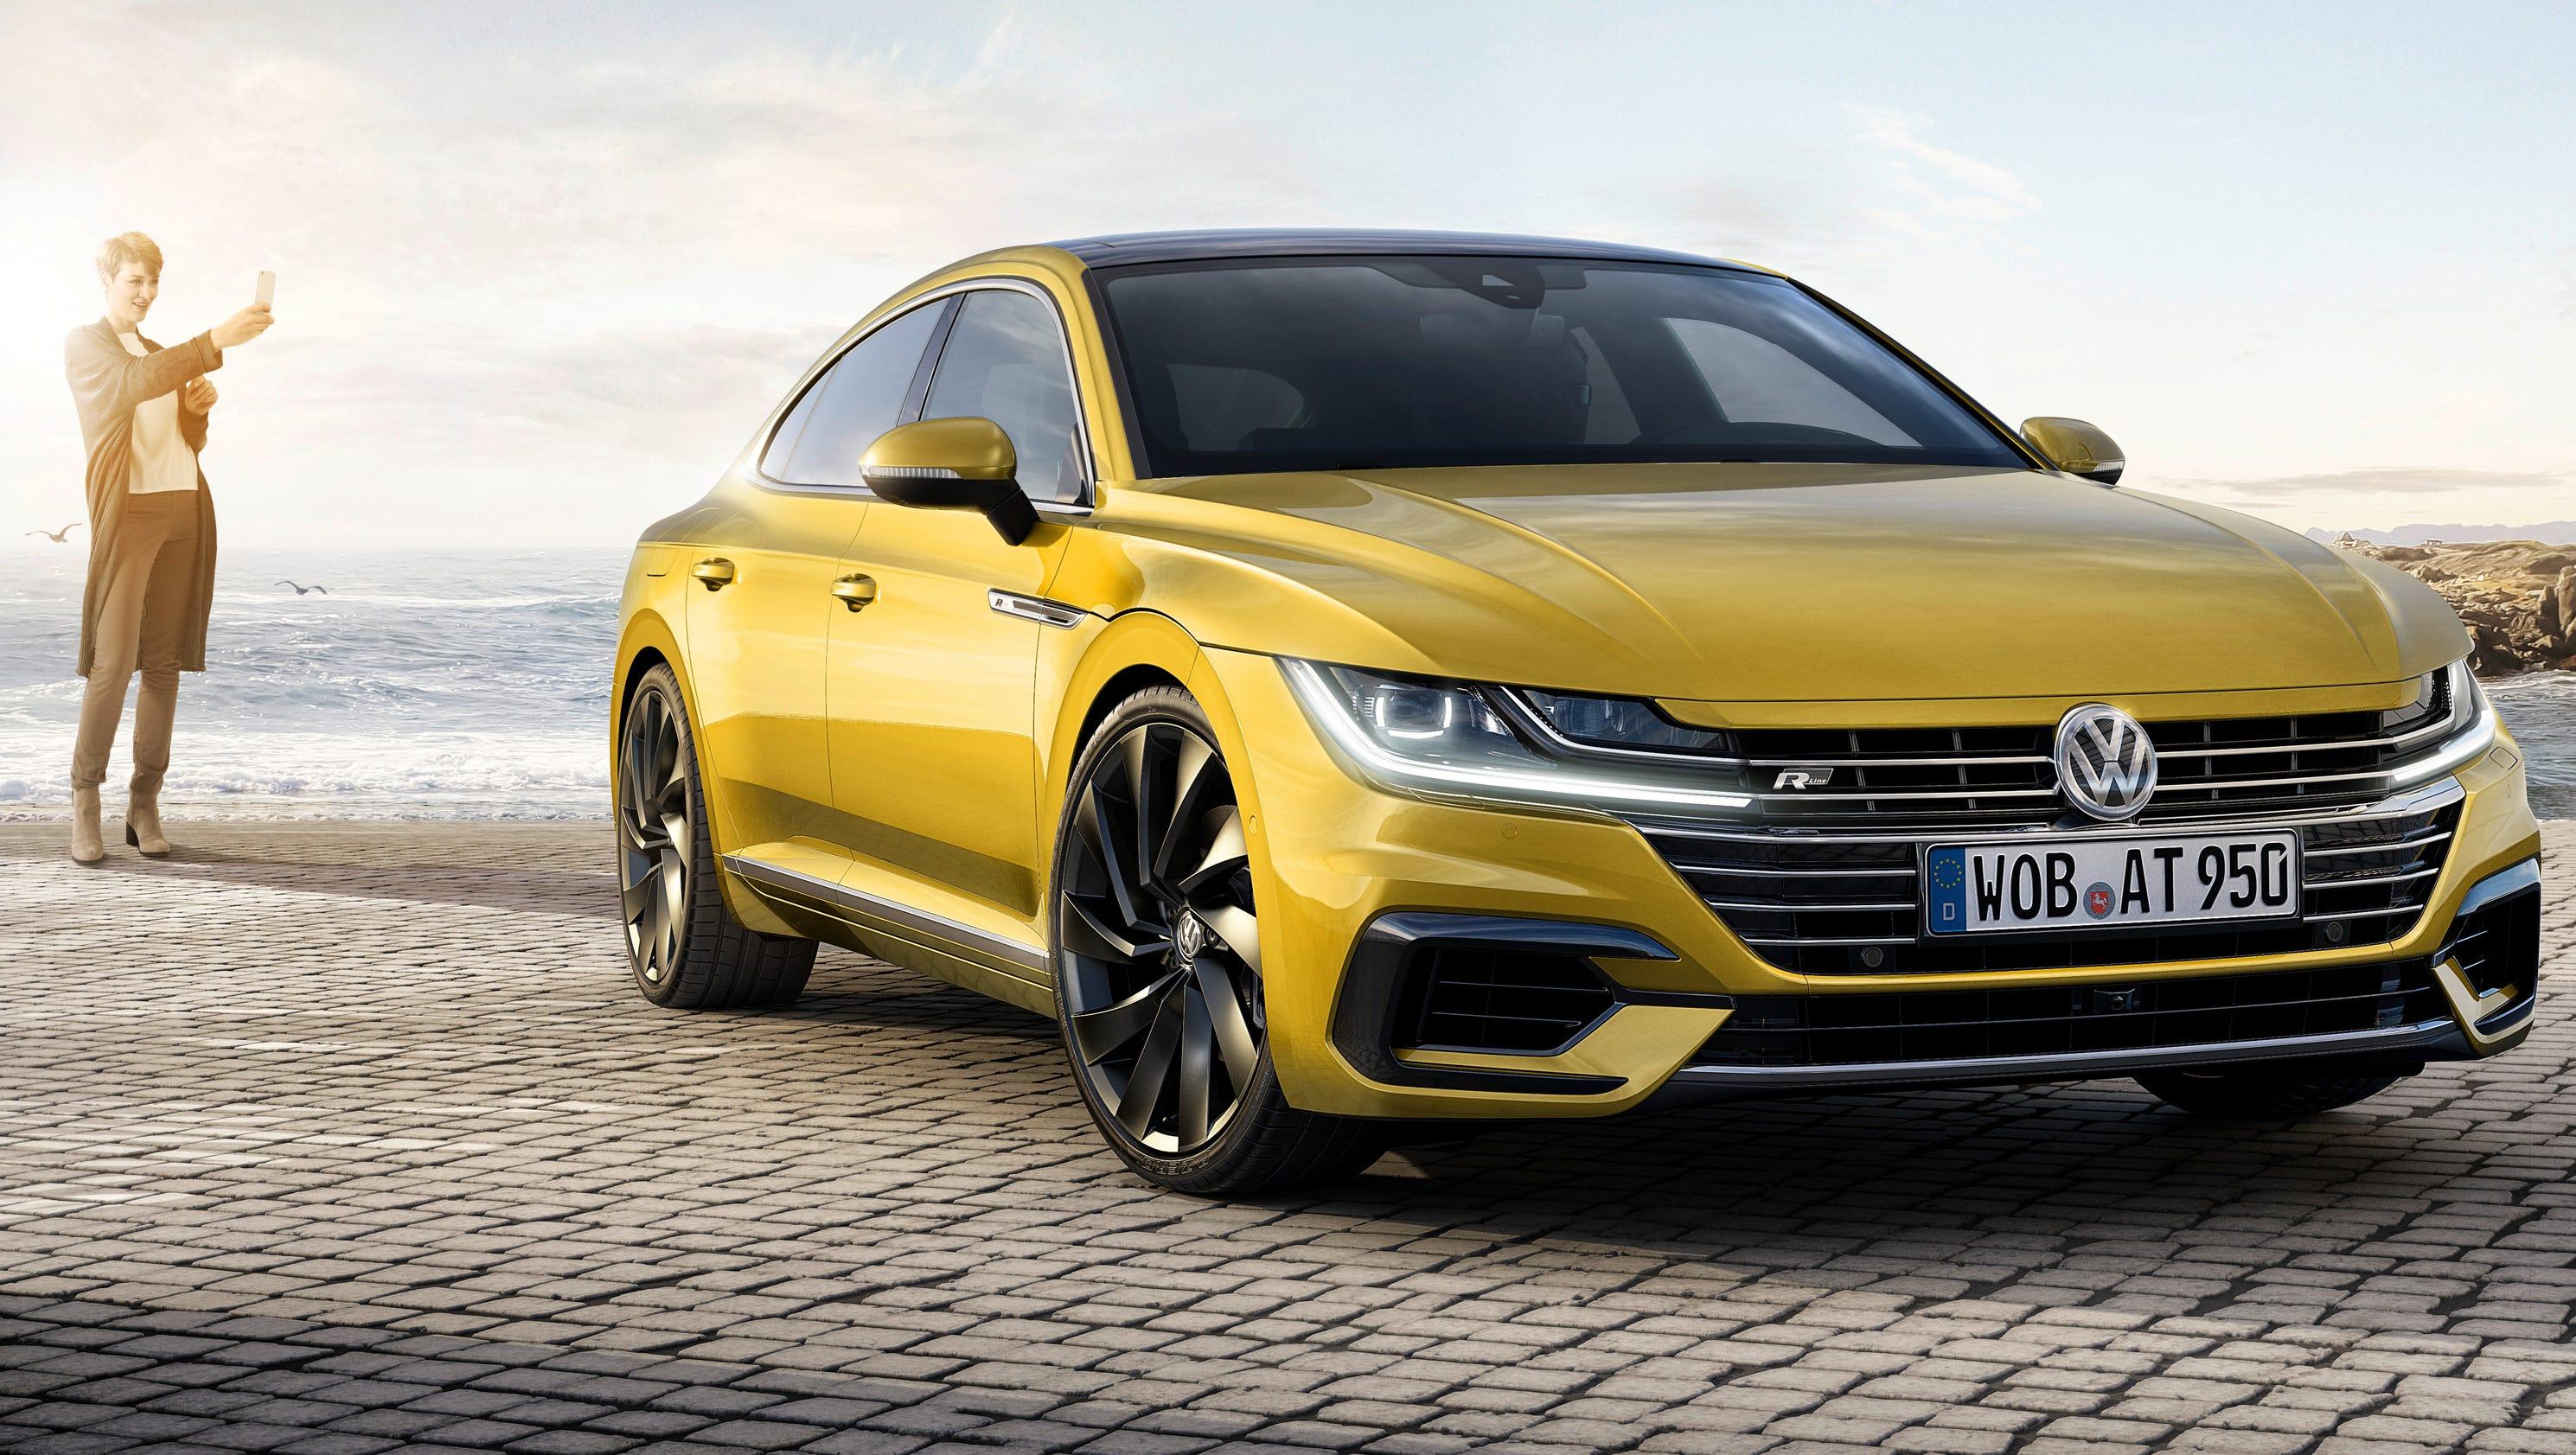 VW shows its sleek new CC sedan replacement, Arteon